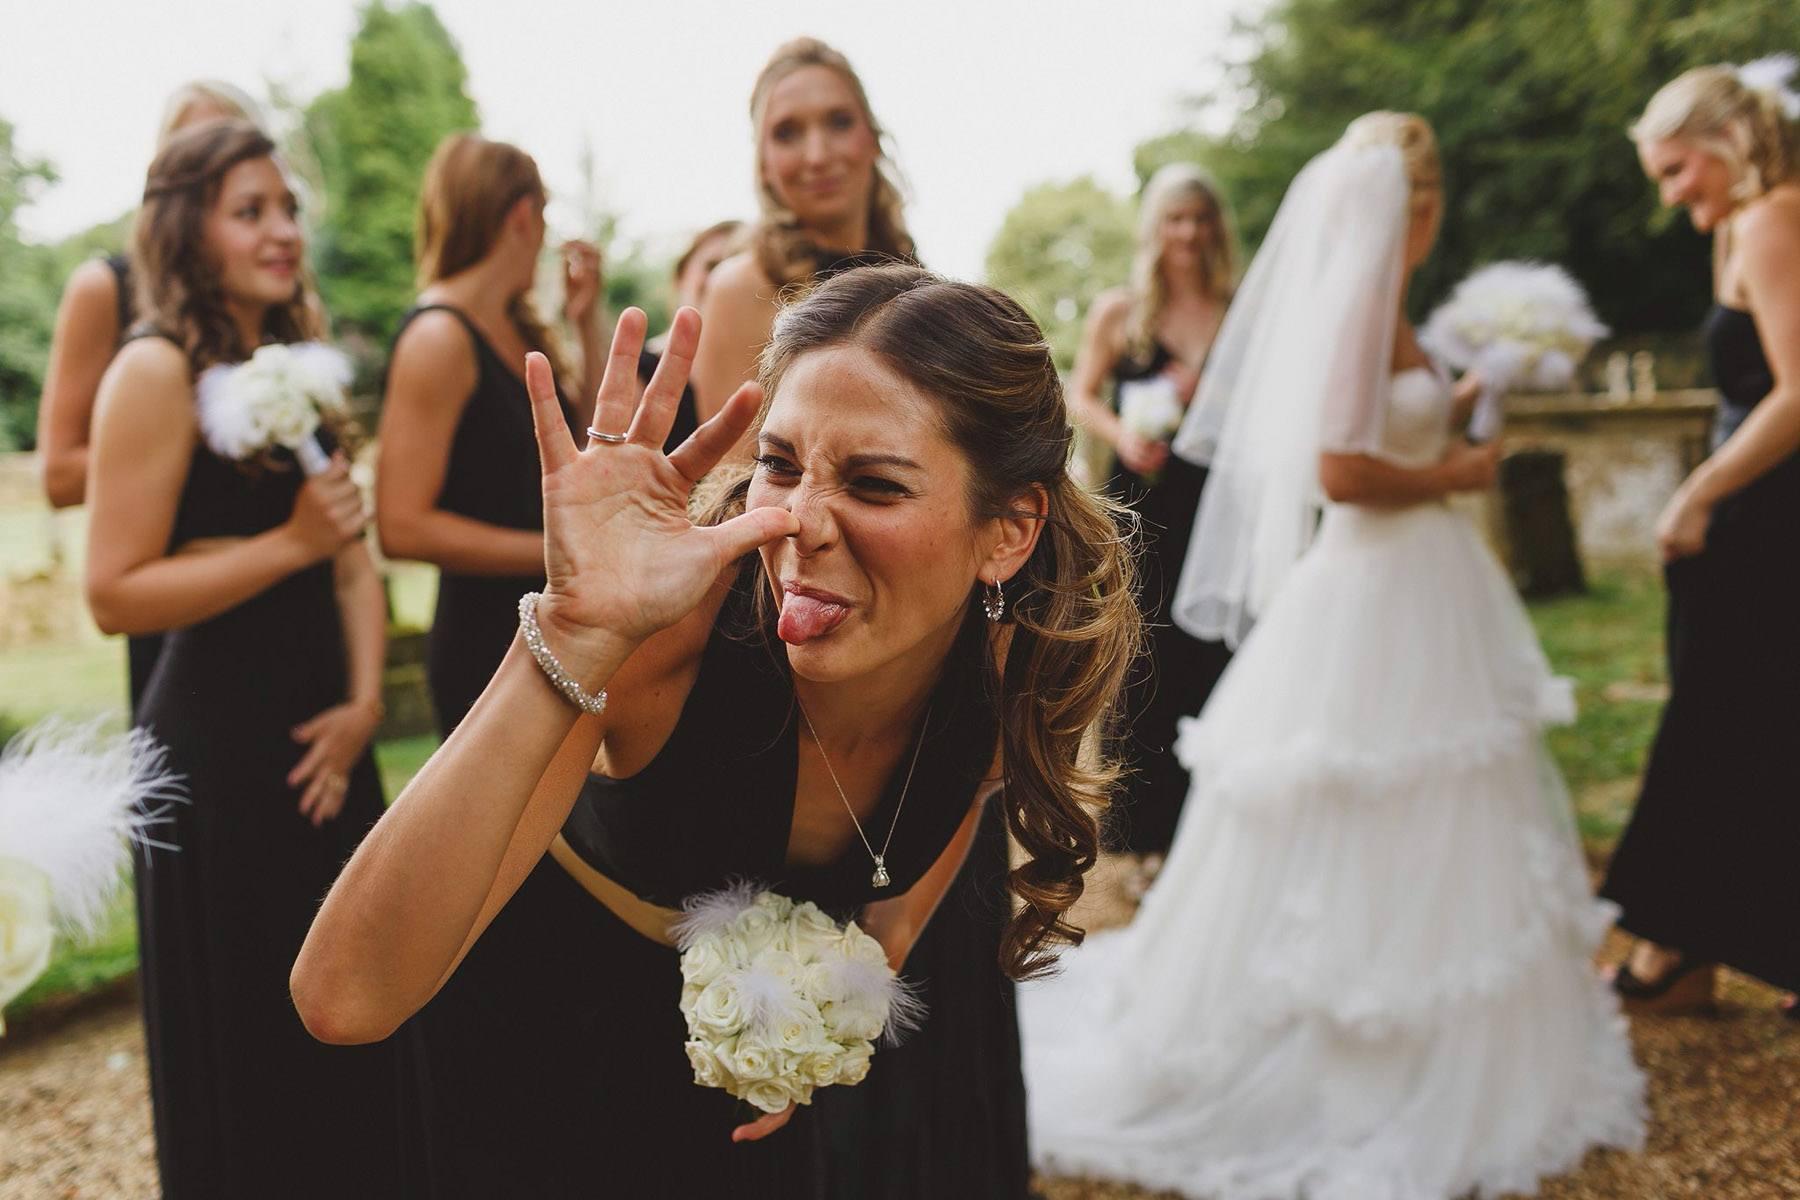 oxfordshire-wedding-photographer-028